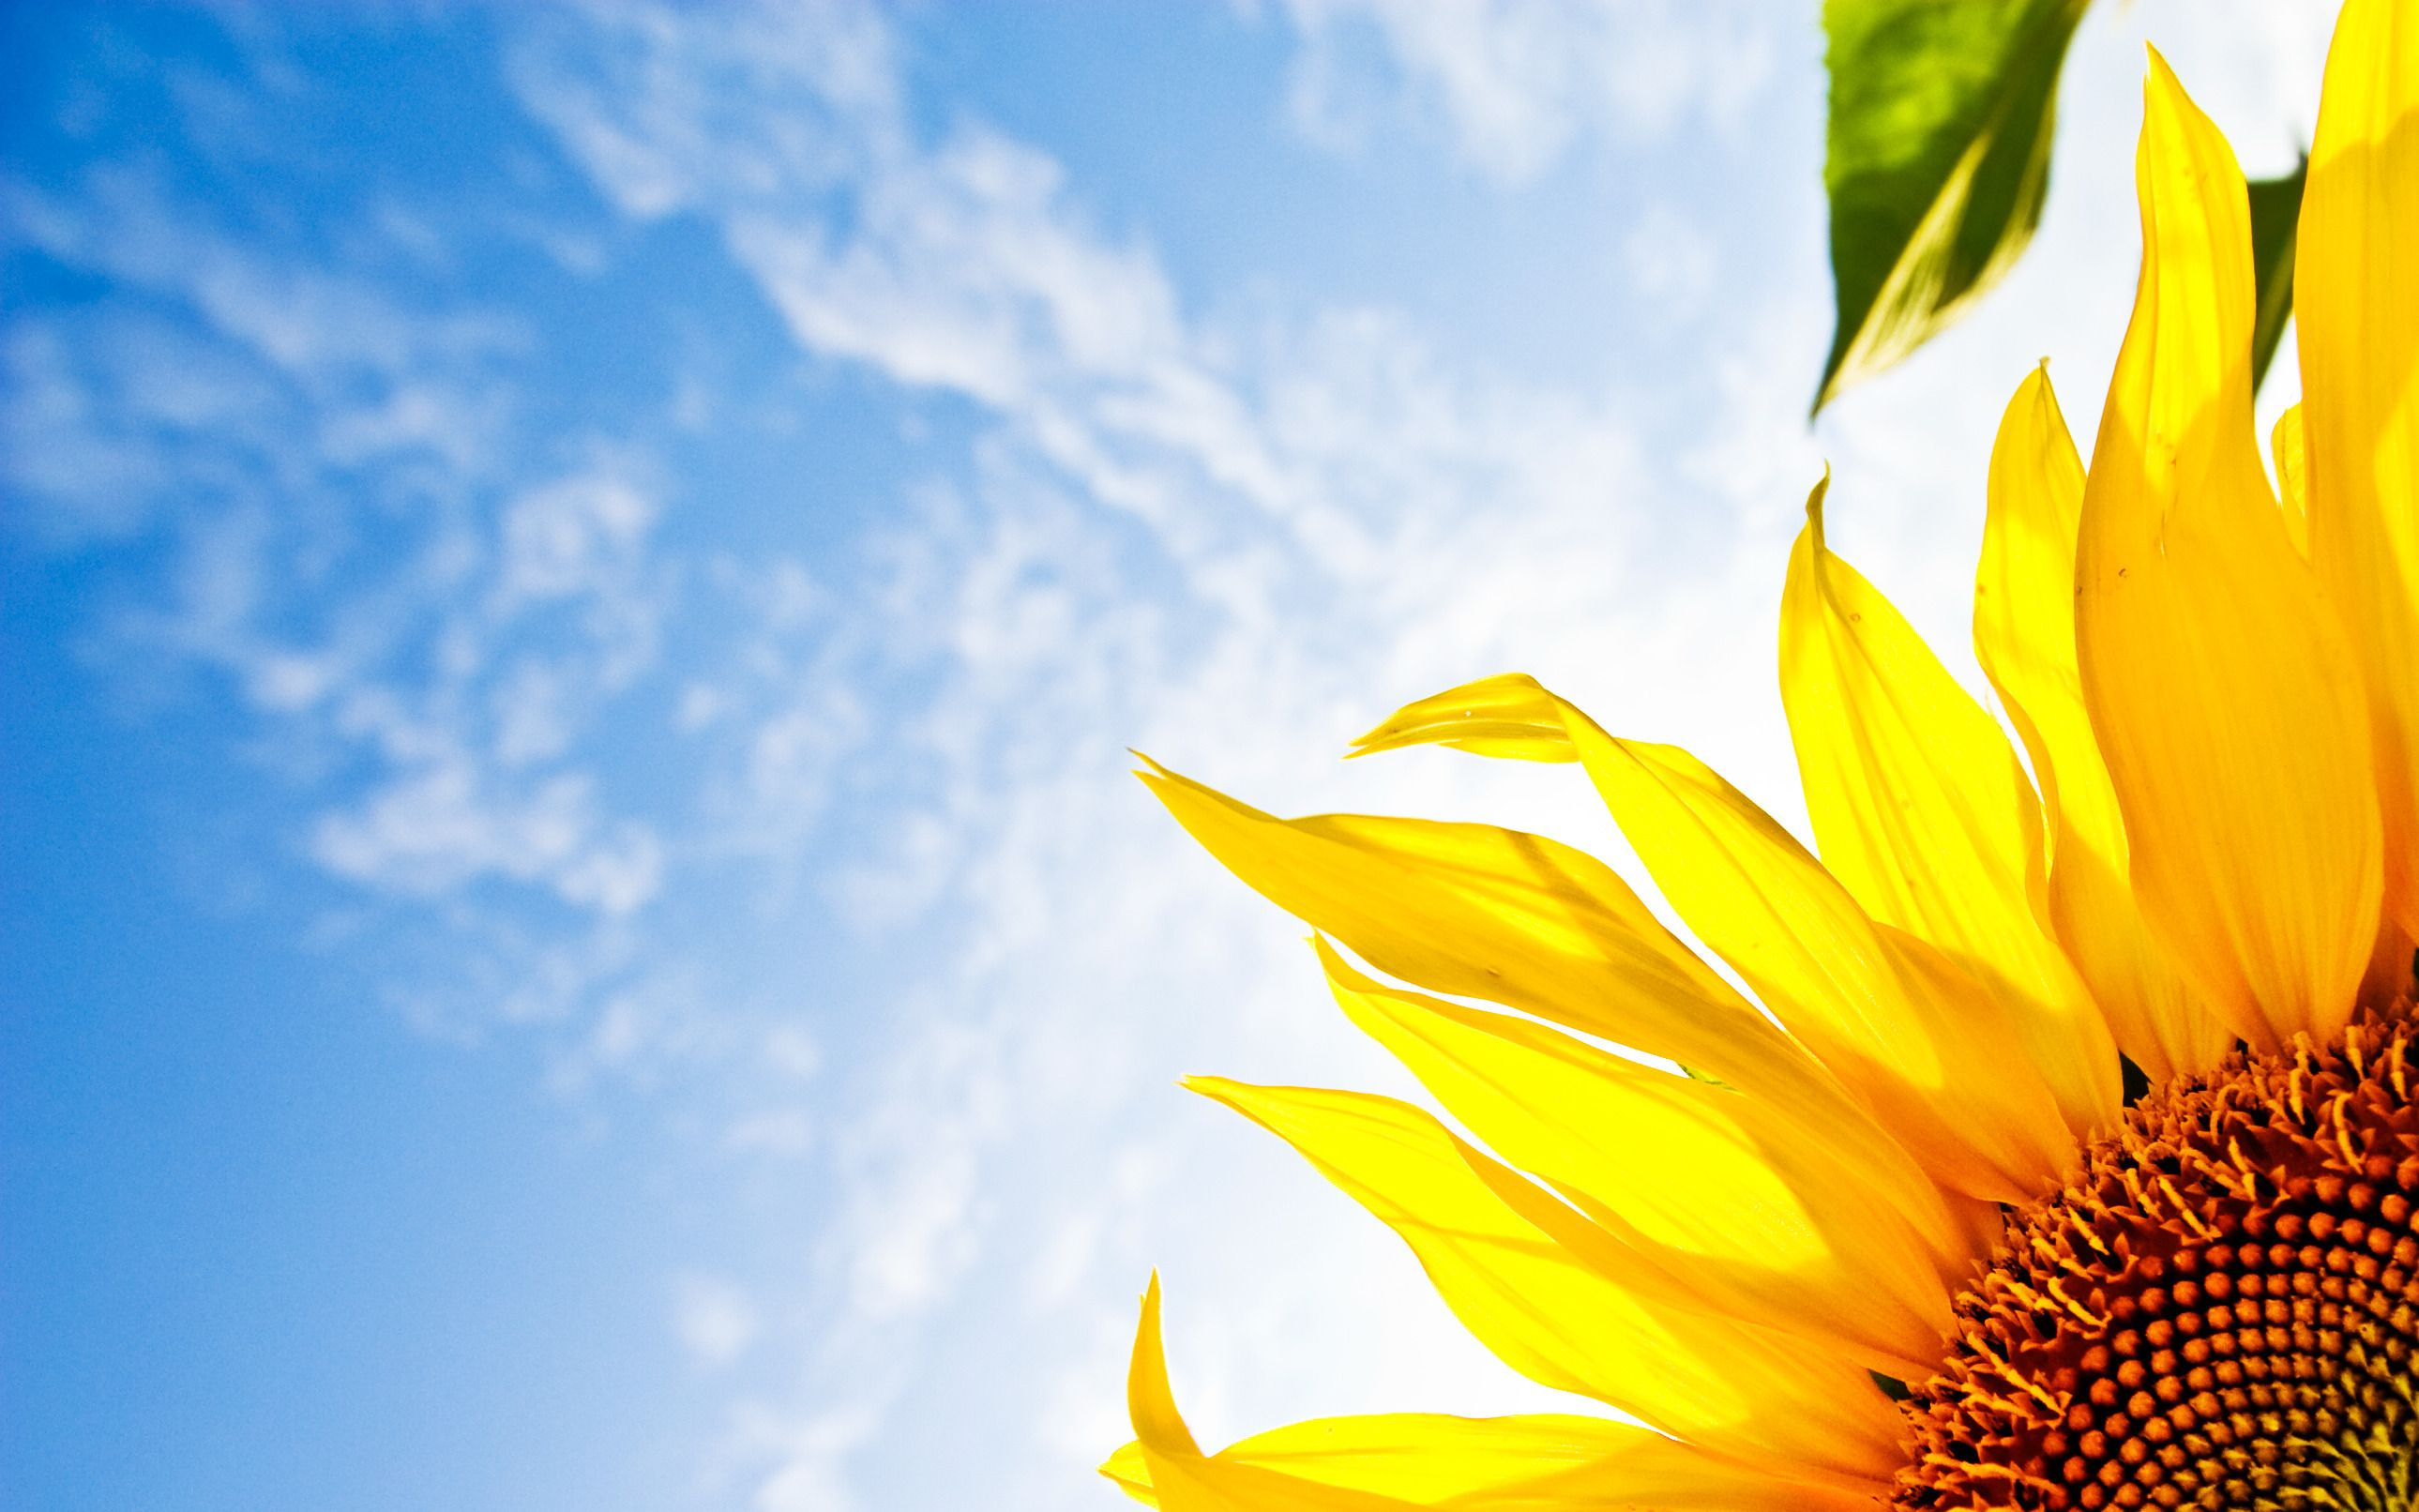 Windows 10 Wallpapers Free Wallpaper Desktop Chainimage Sunflower Wallpaper Sunflowers Background Blue Sky Wallpaper